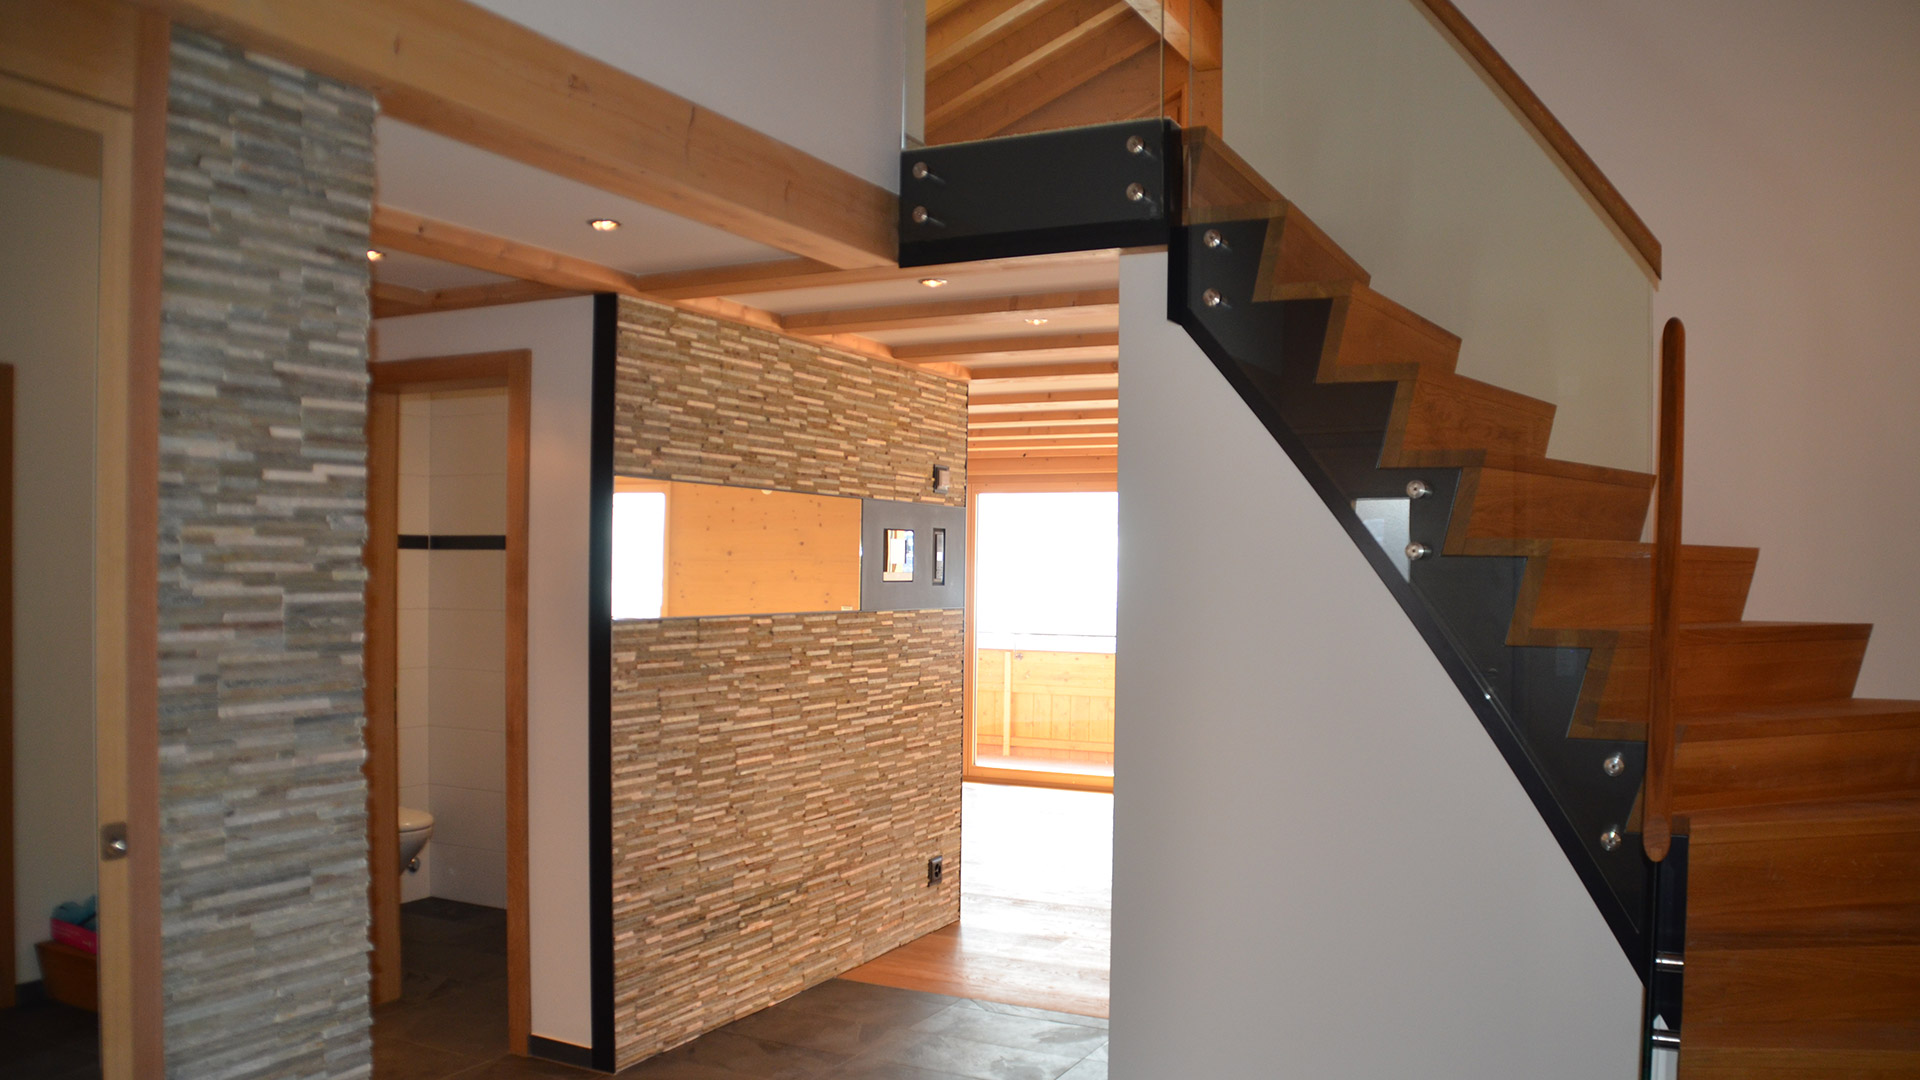 Chalet Columba Apartments, Switzerland